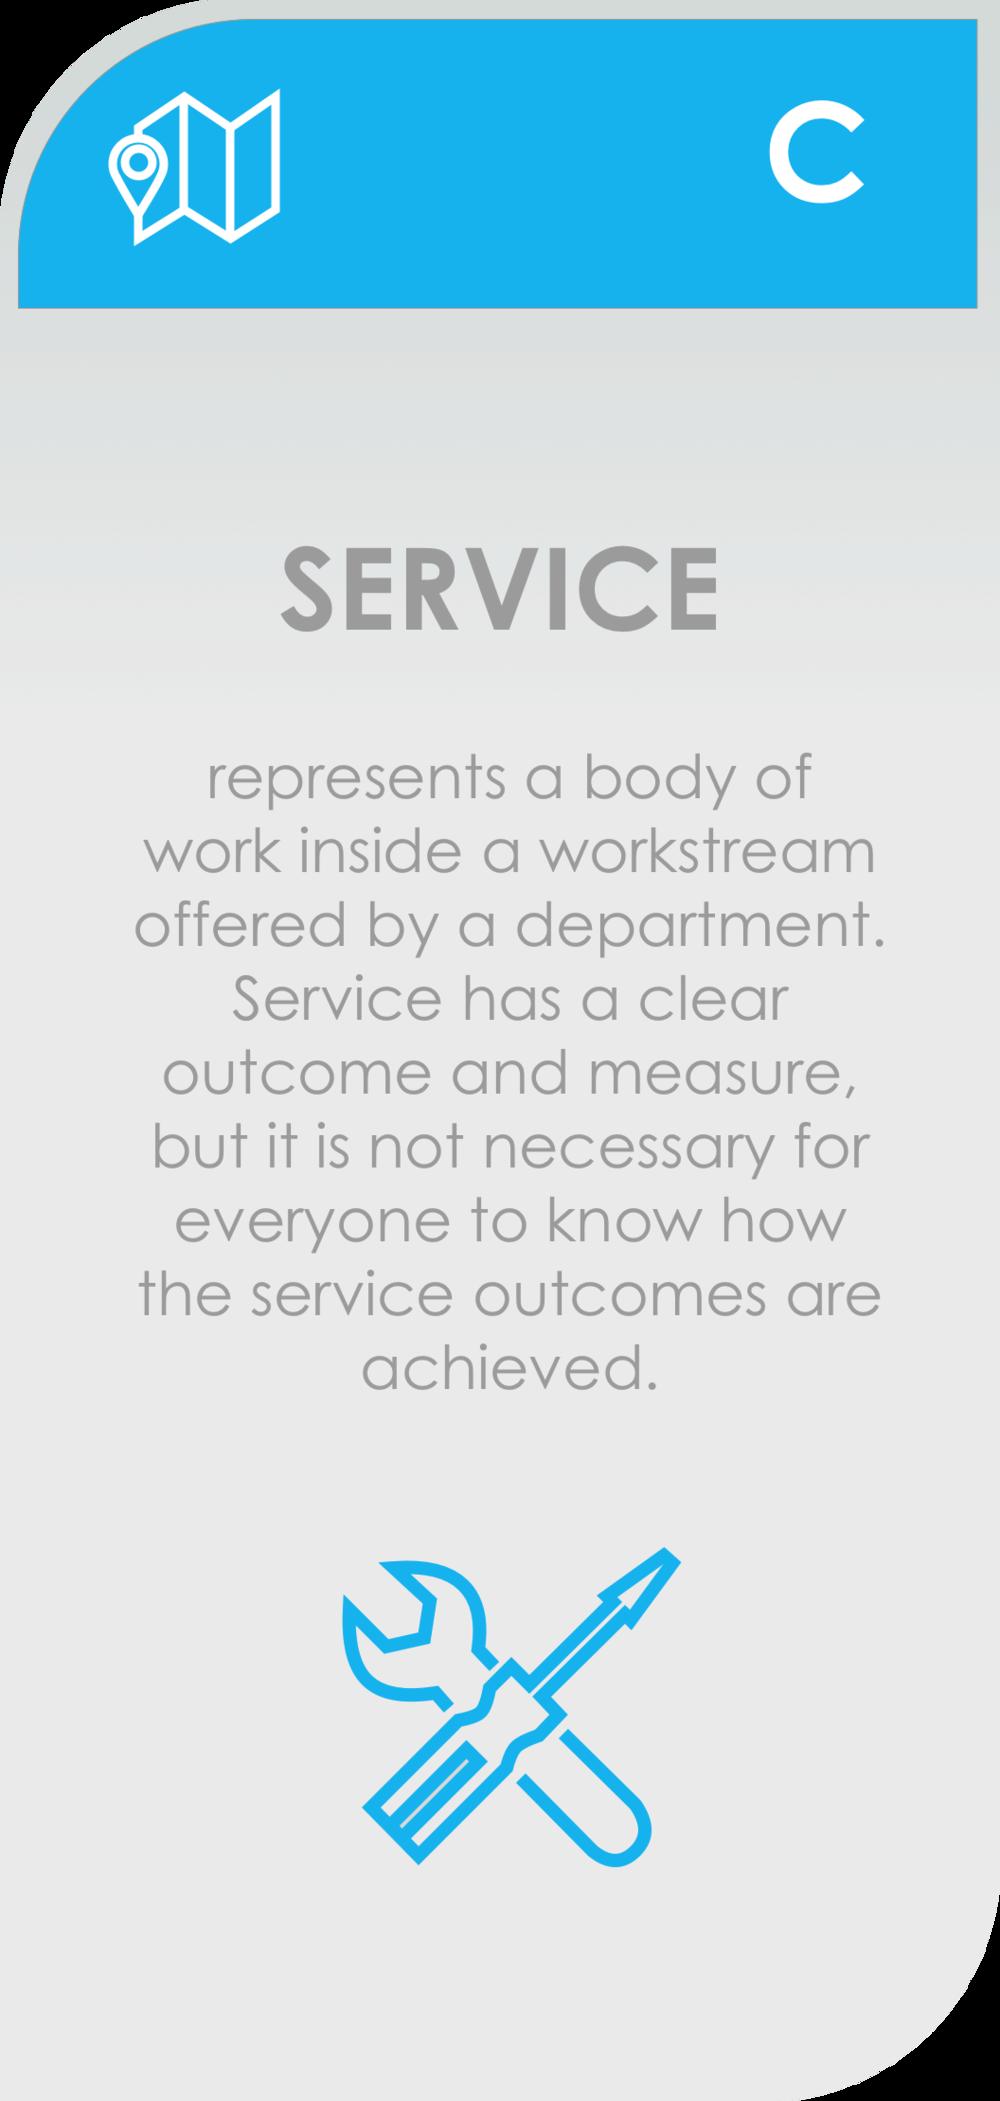 C - SERVICE.png